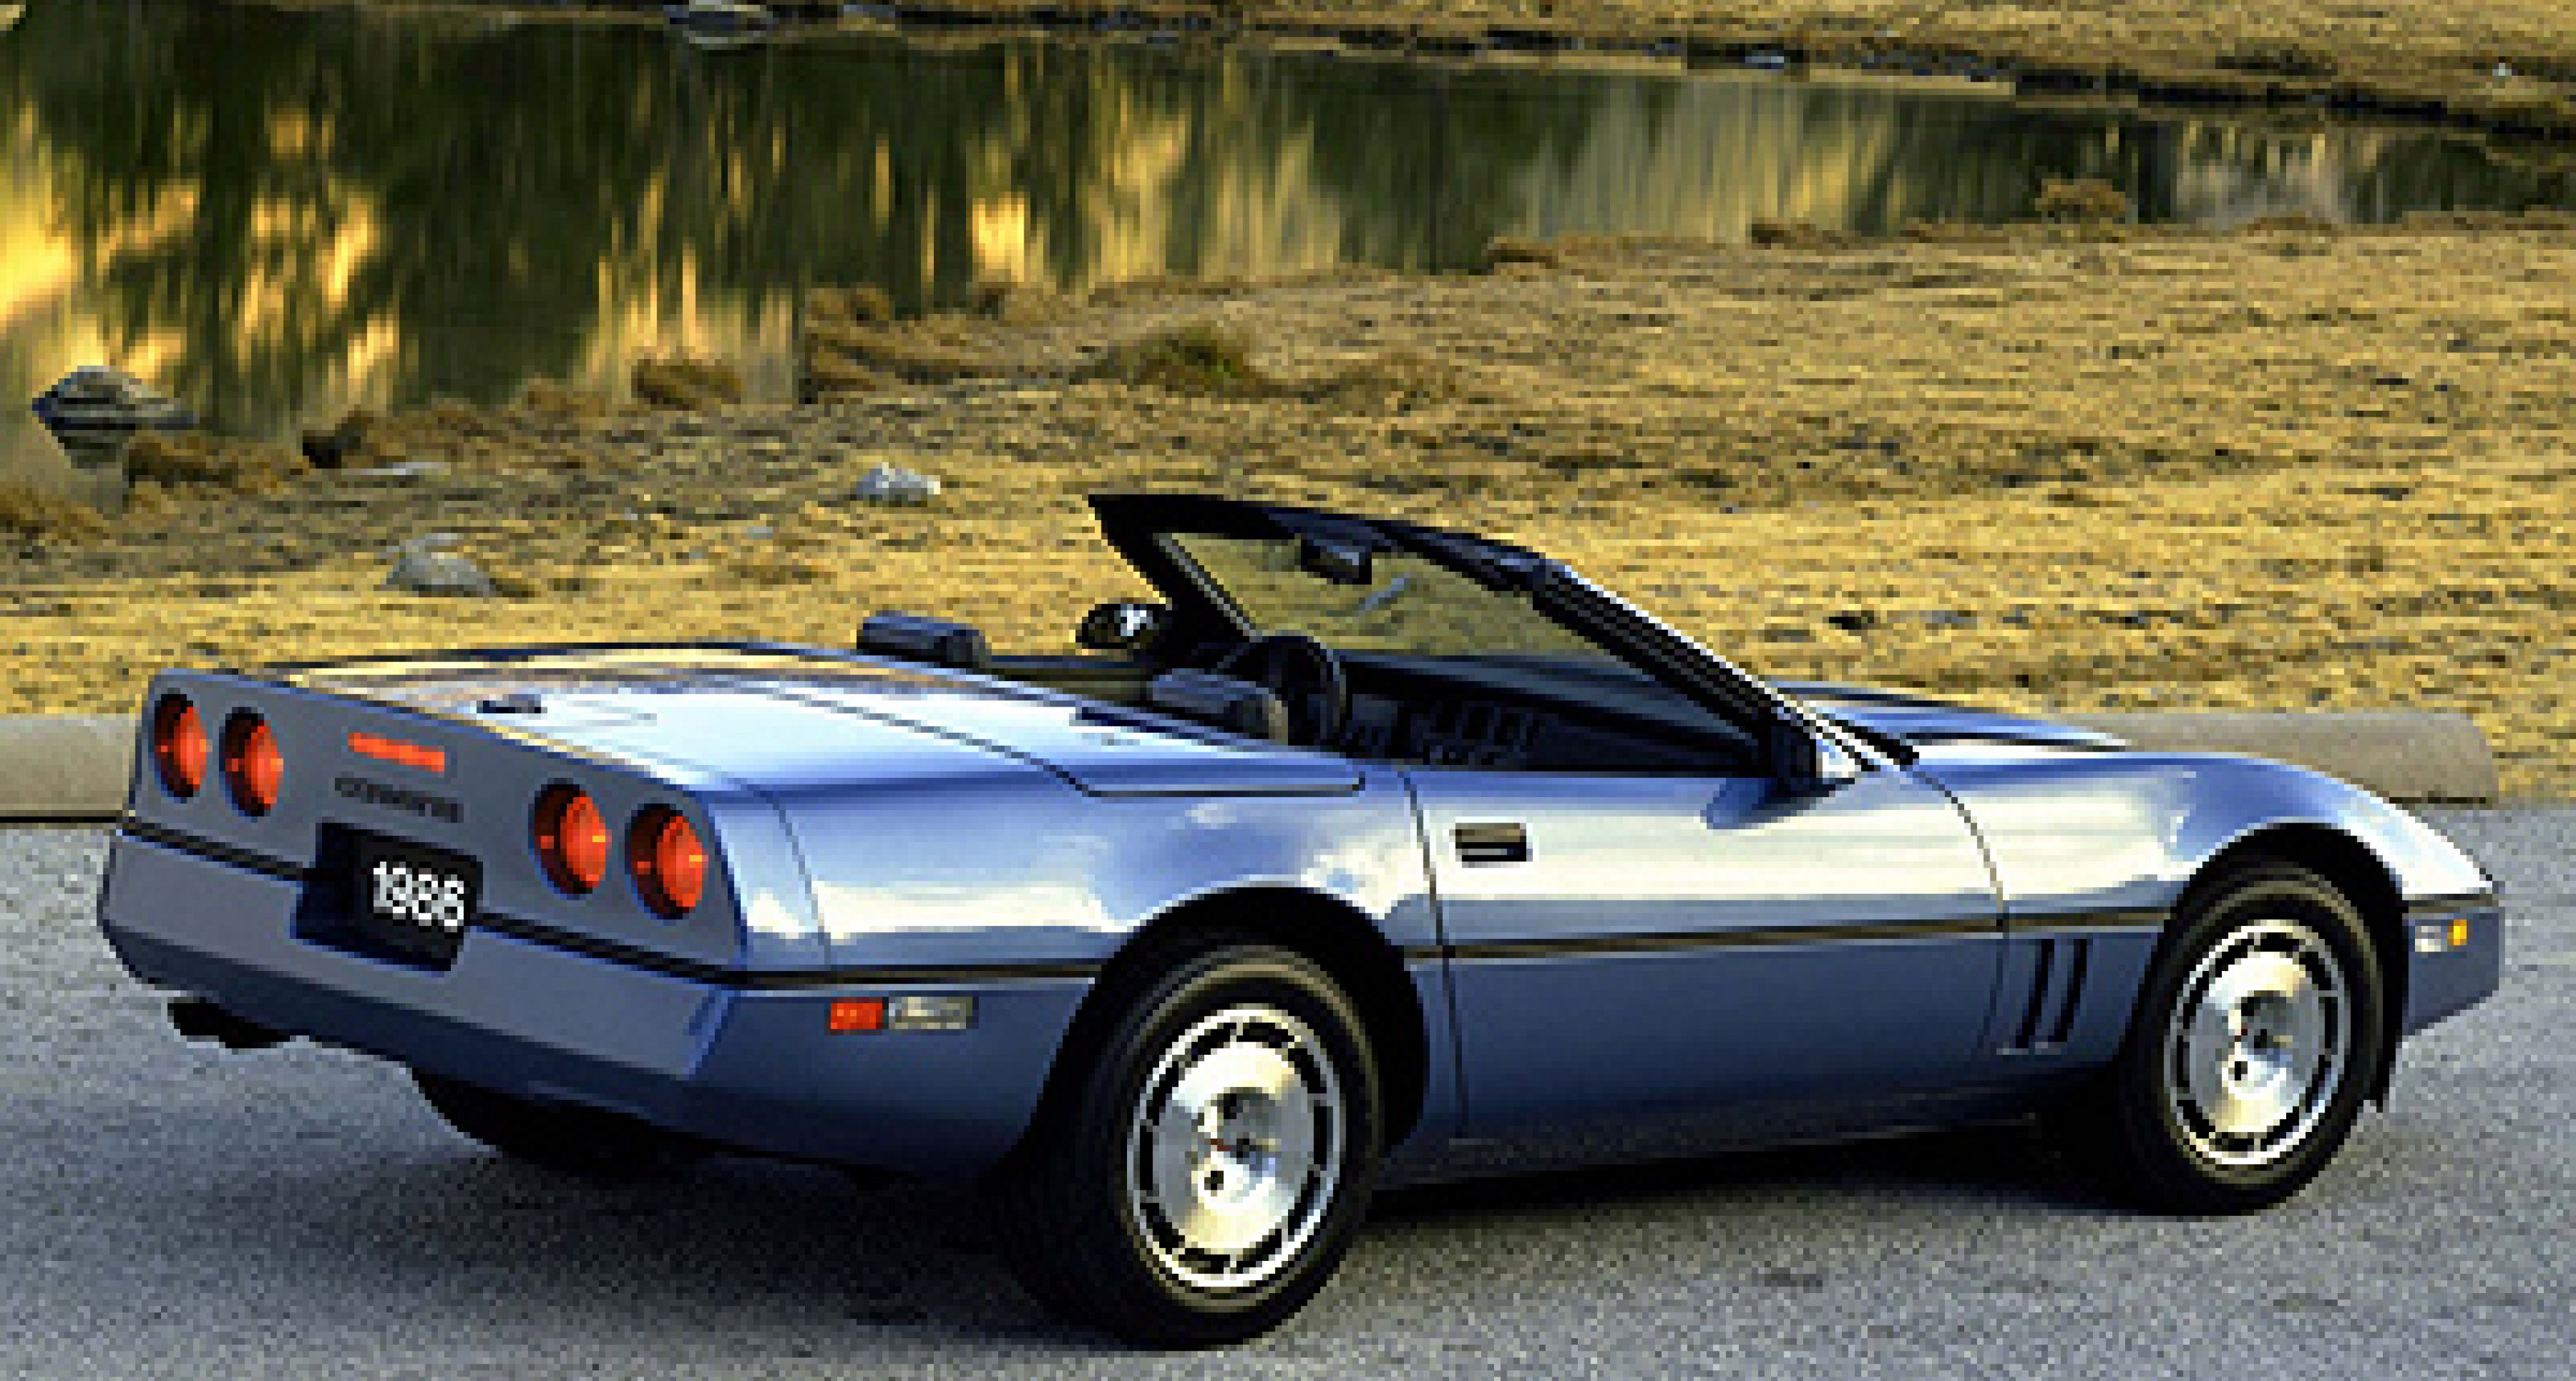 60 Jahre Chevrolet Corvette